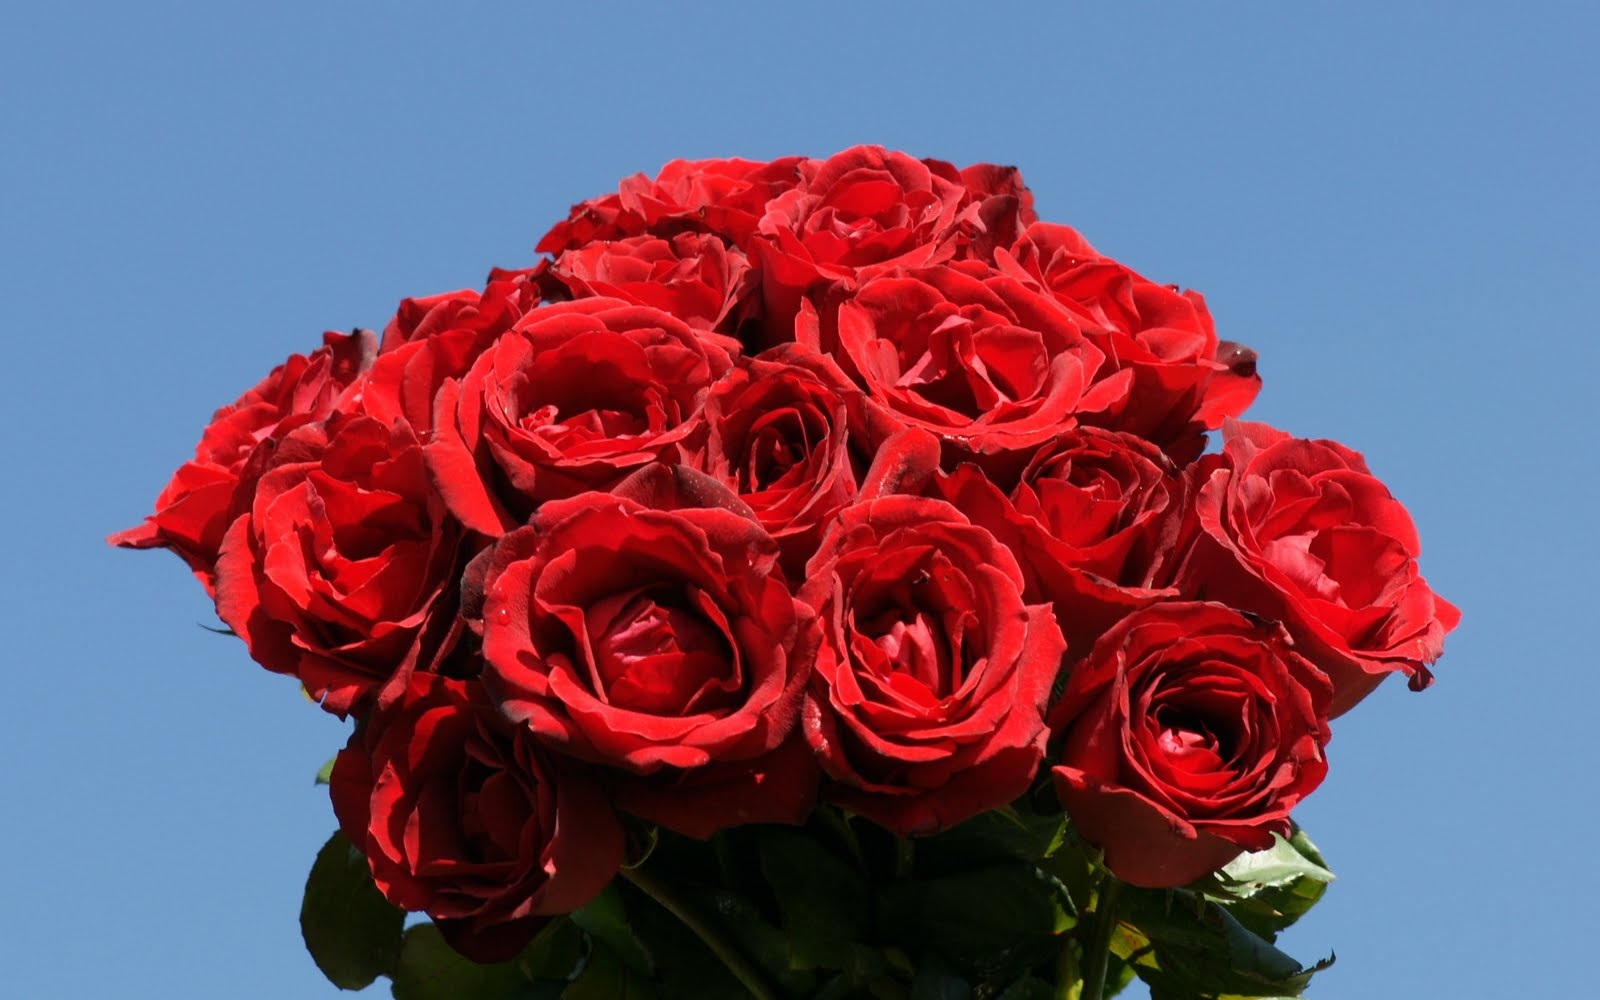 COOL WALLPAPERS: red rose wallpaper